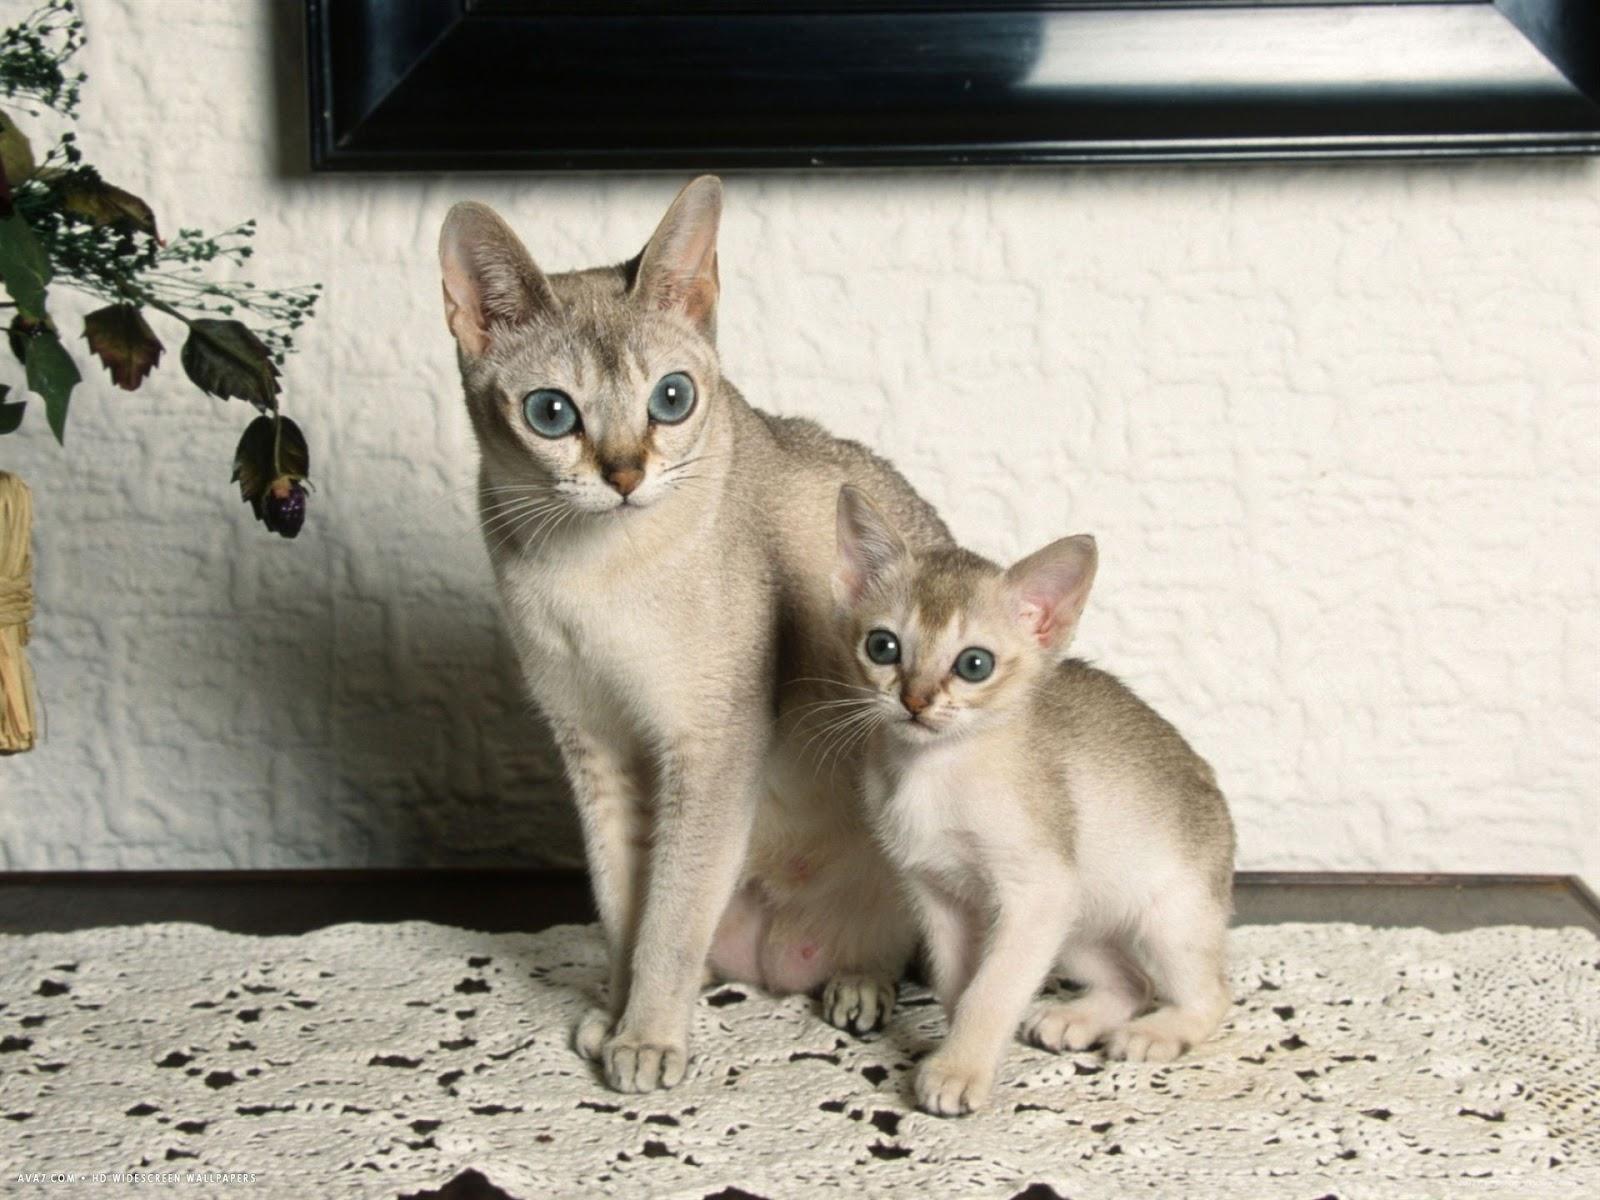 Mèo Singapura mẹ chăm mèo con rất tốt